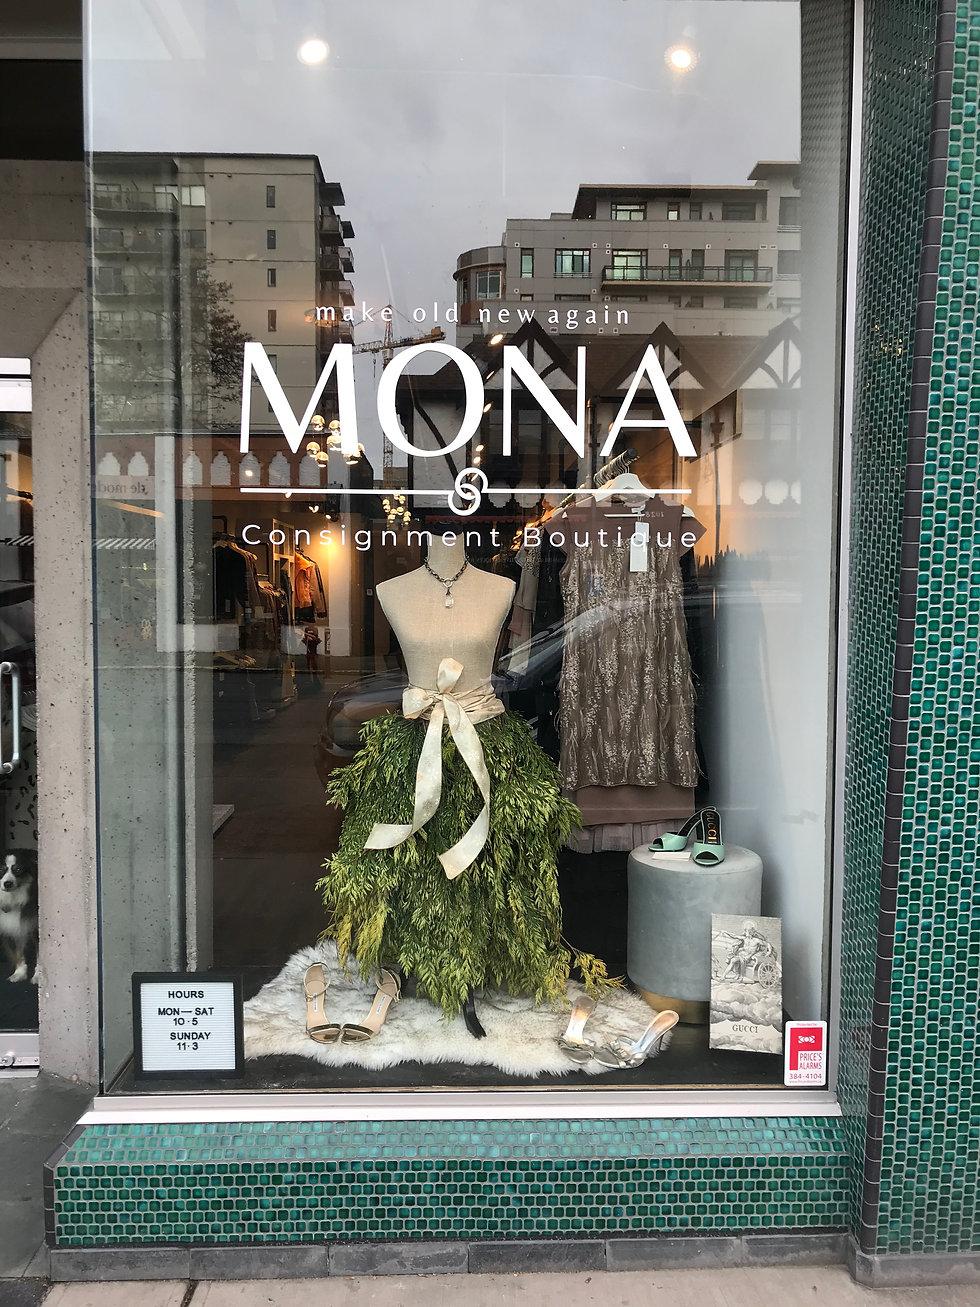 MONA Consignment.JPG